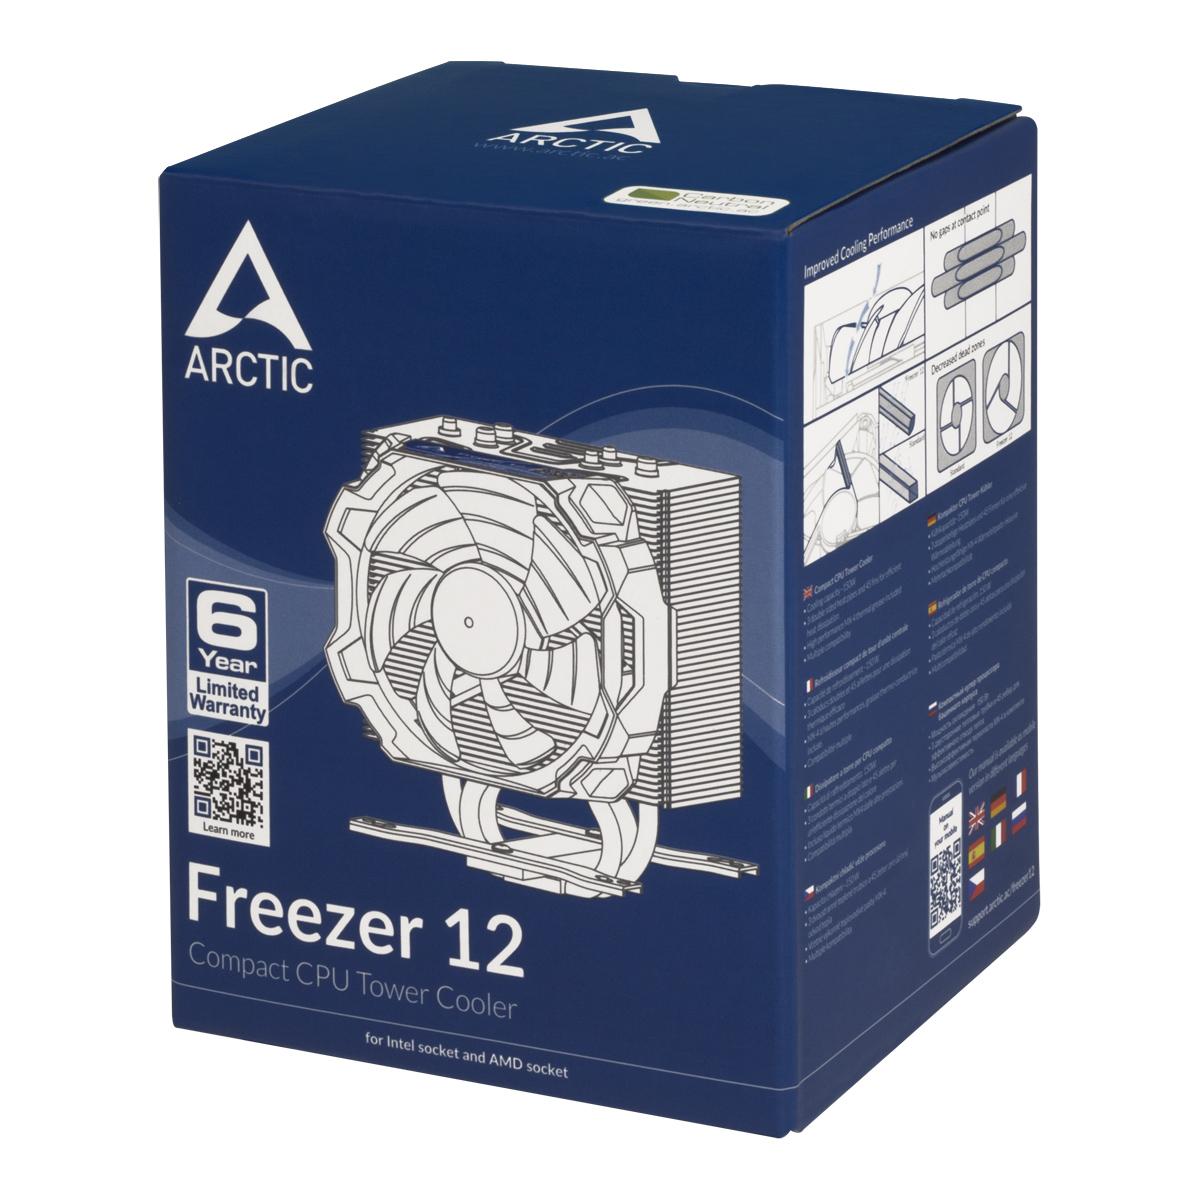 Freezer 12